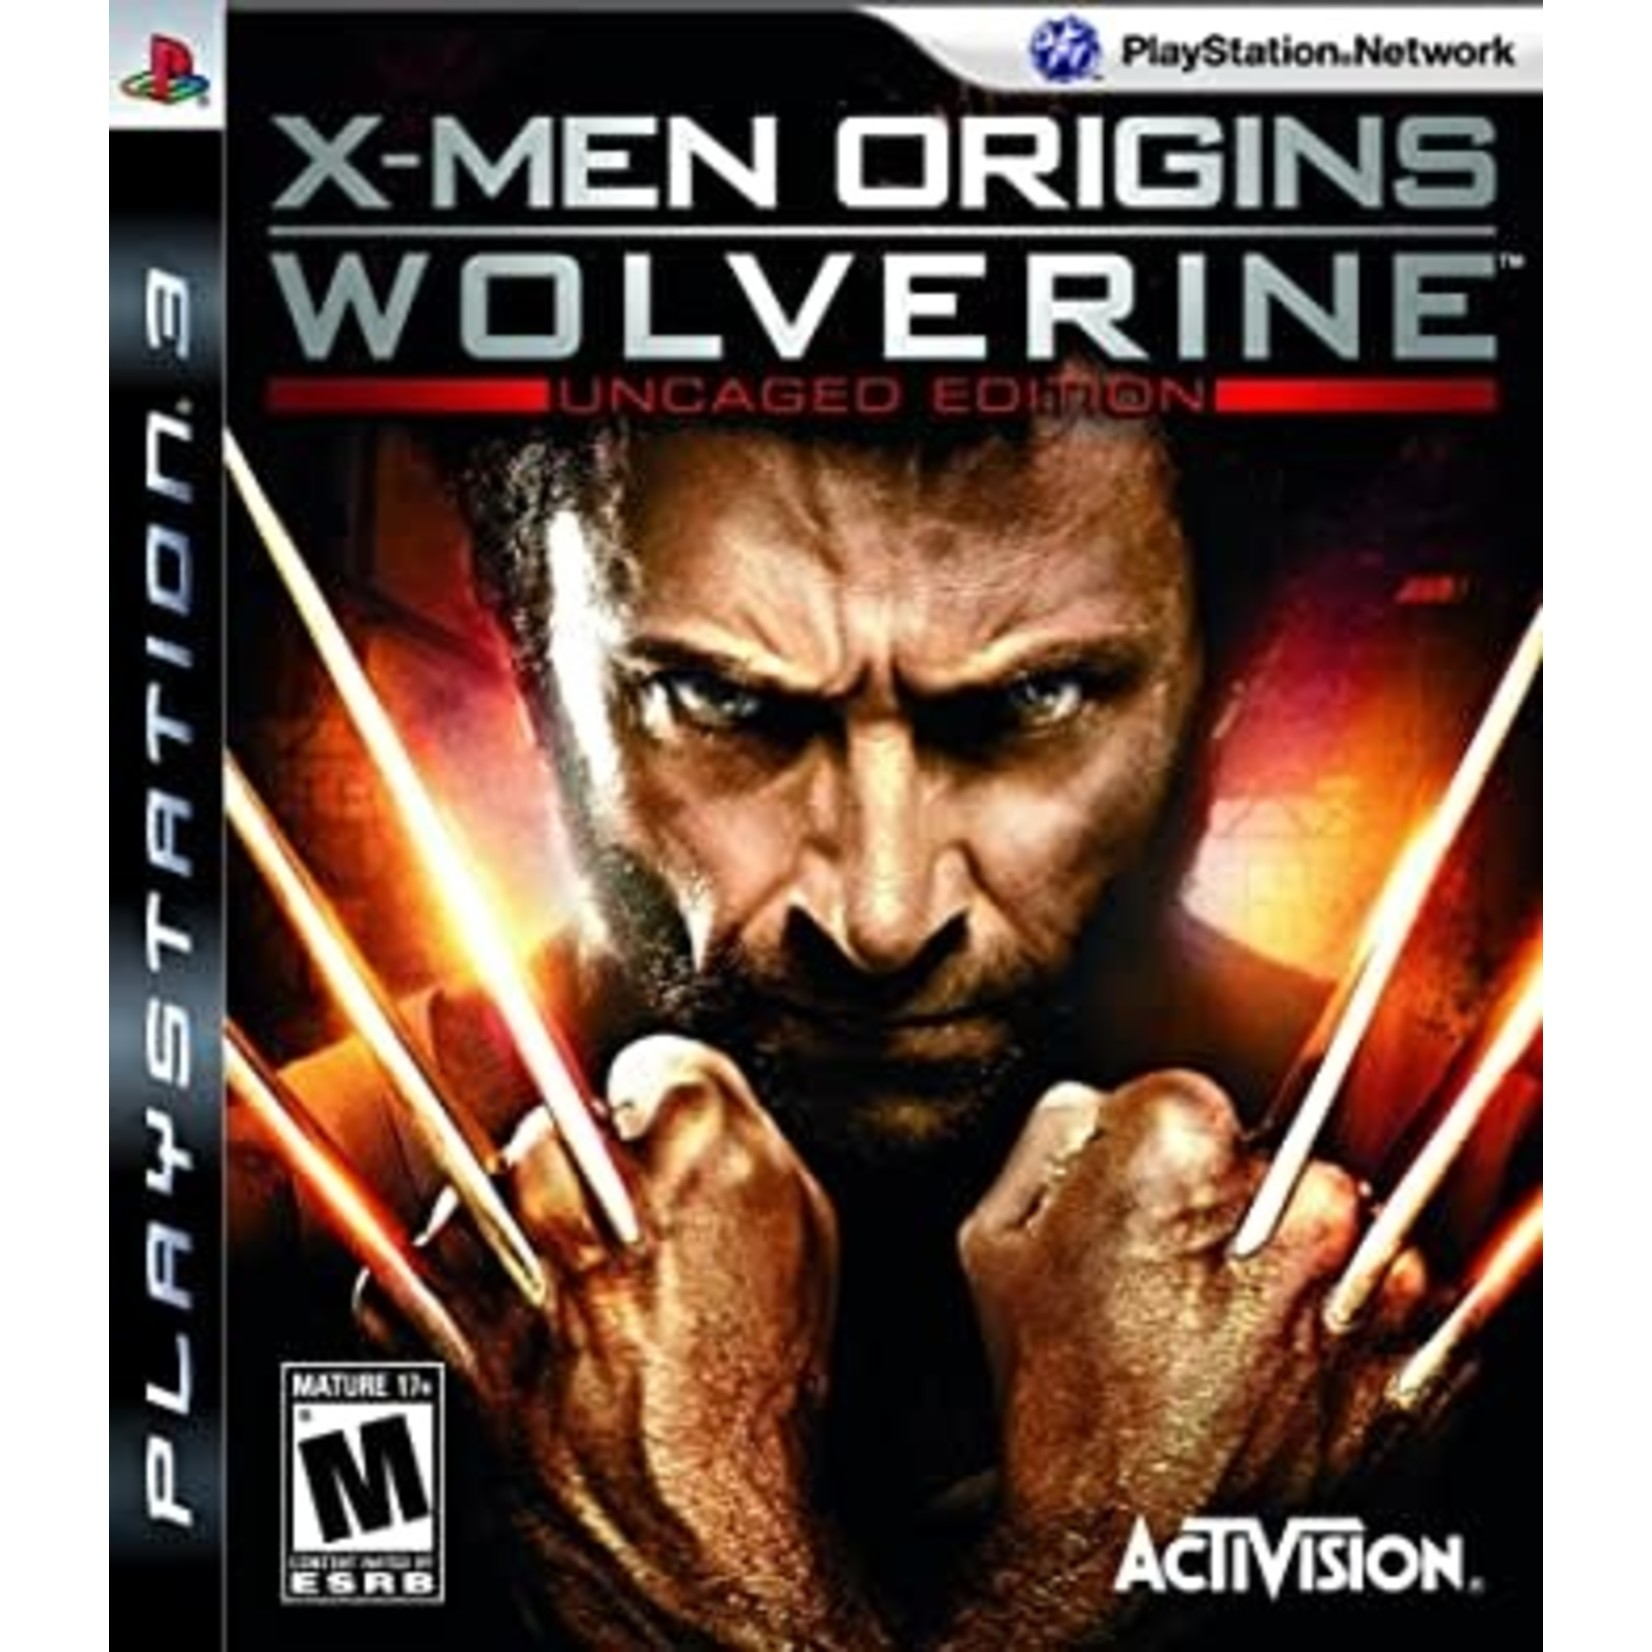 PS3U-X-MEN ORIGINS WOLVERINE